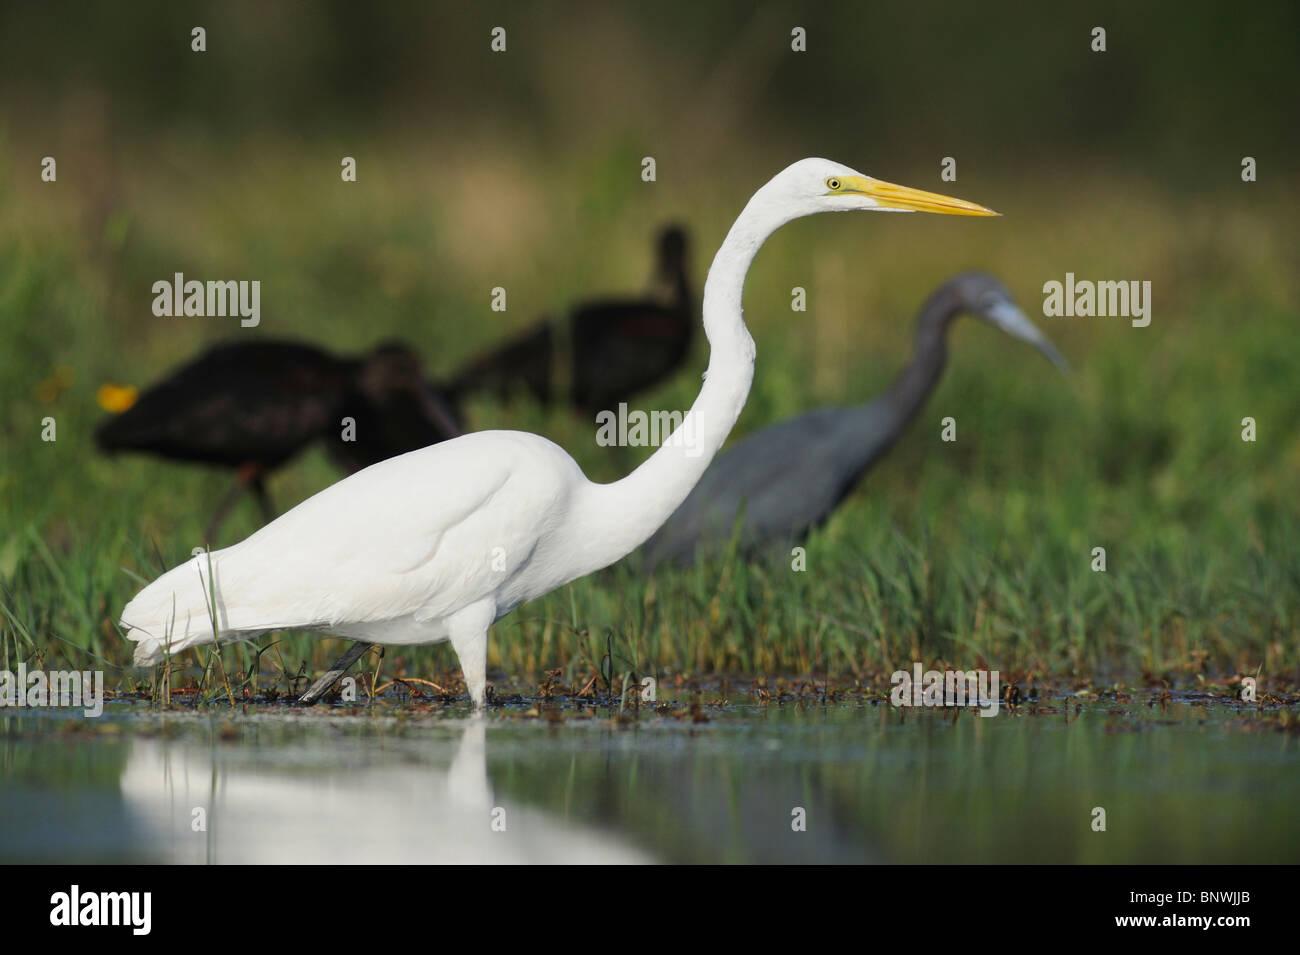 Great Egret ( Ardea alba),adult among other waders, Fennessey Ranch, Refugio, Coastal Bend,Texas Coast, USA - Stock Image